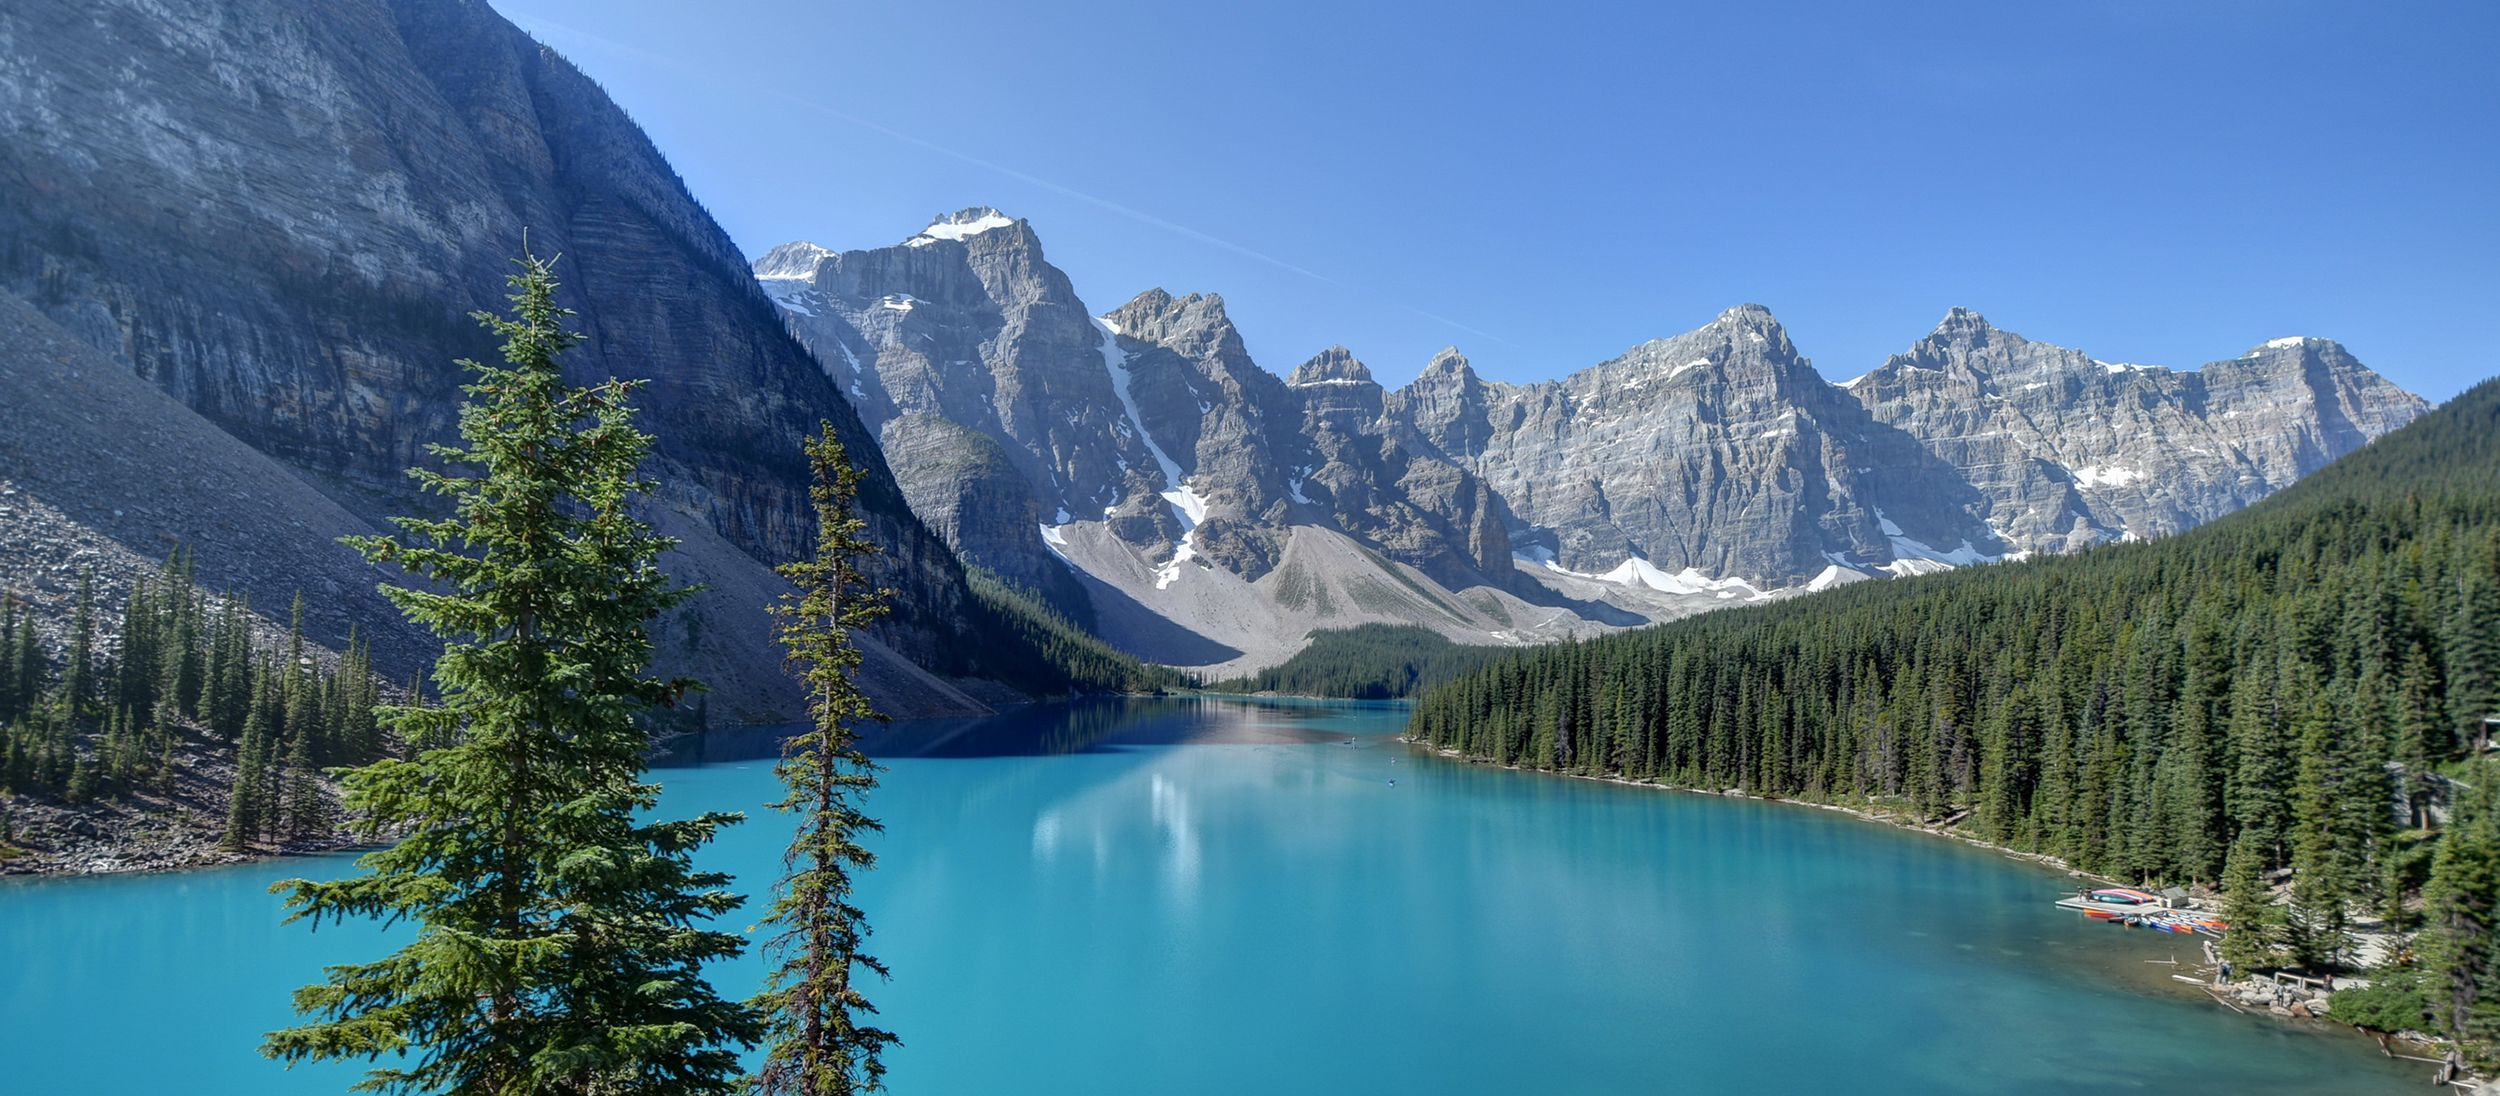 Der Moraine Lake im Banff Nationalpark in Alberta, Kanada